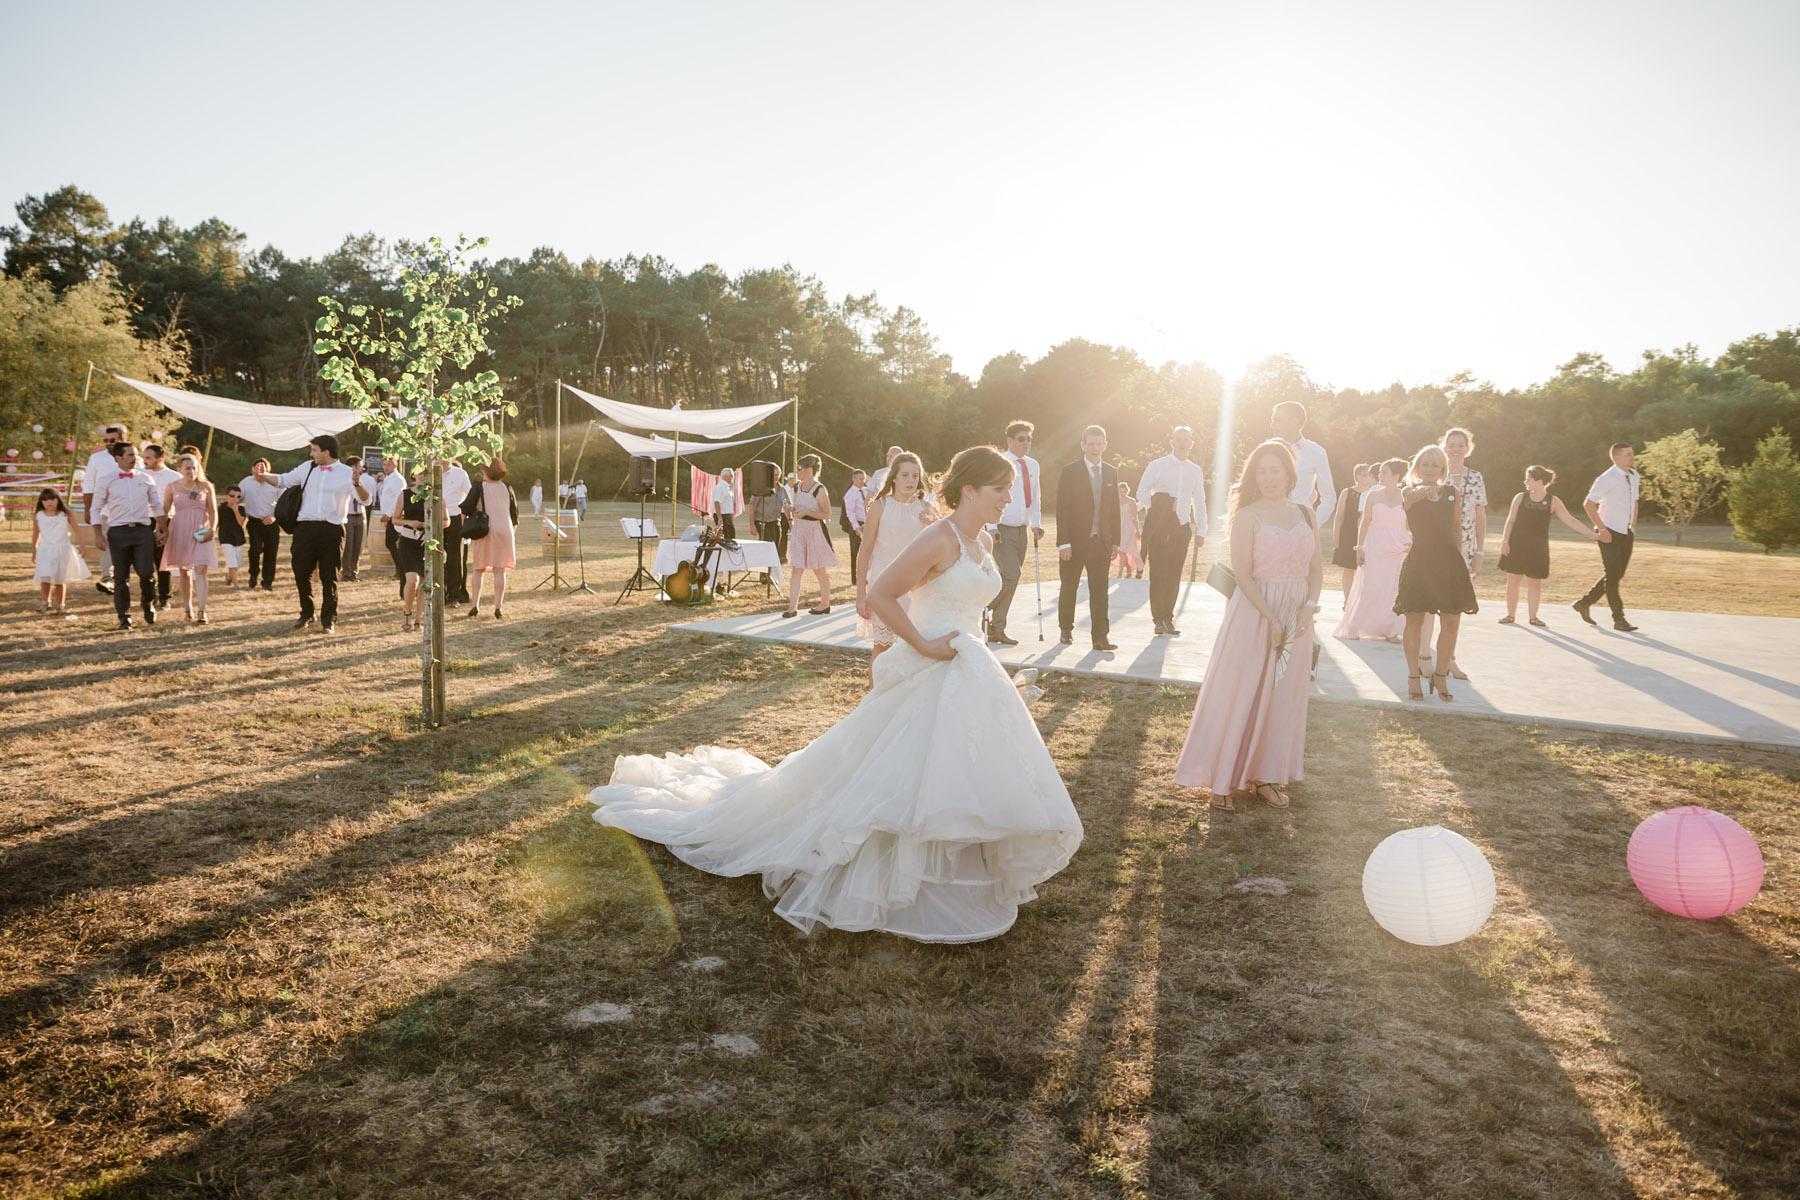 cocktail mariage diy photographe mariage bordeaux landes fineart francais sarah miramon blog 29